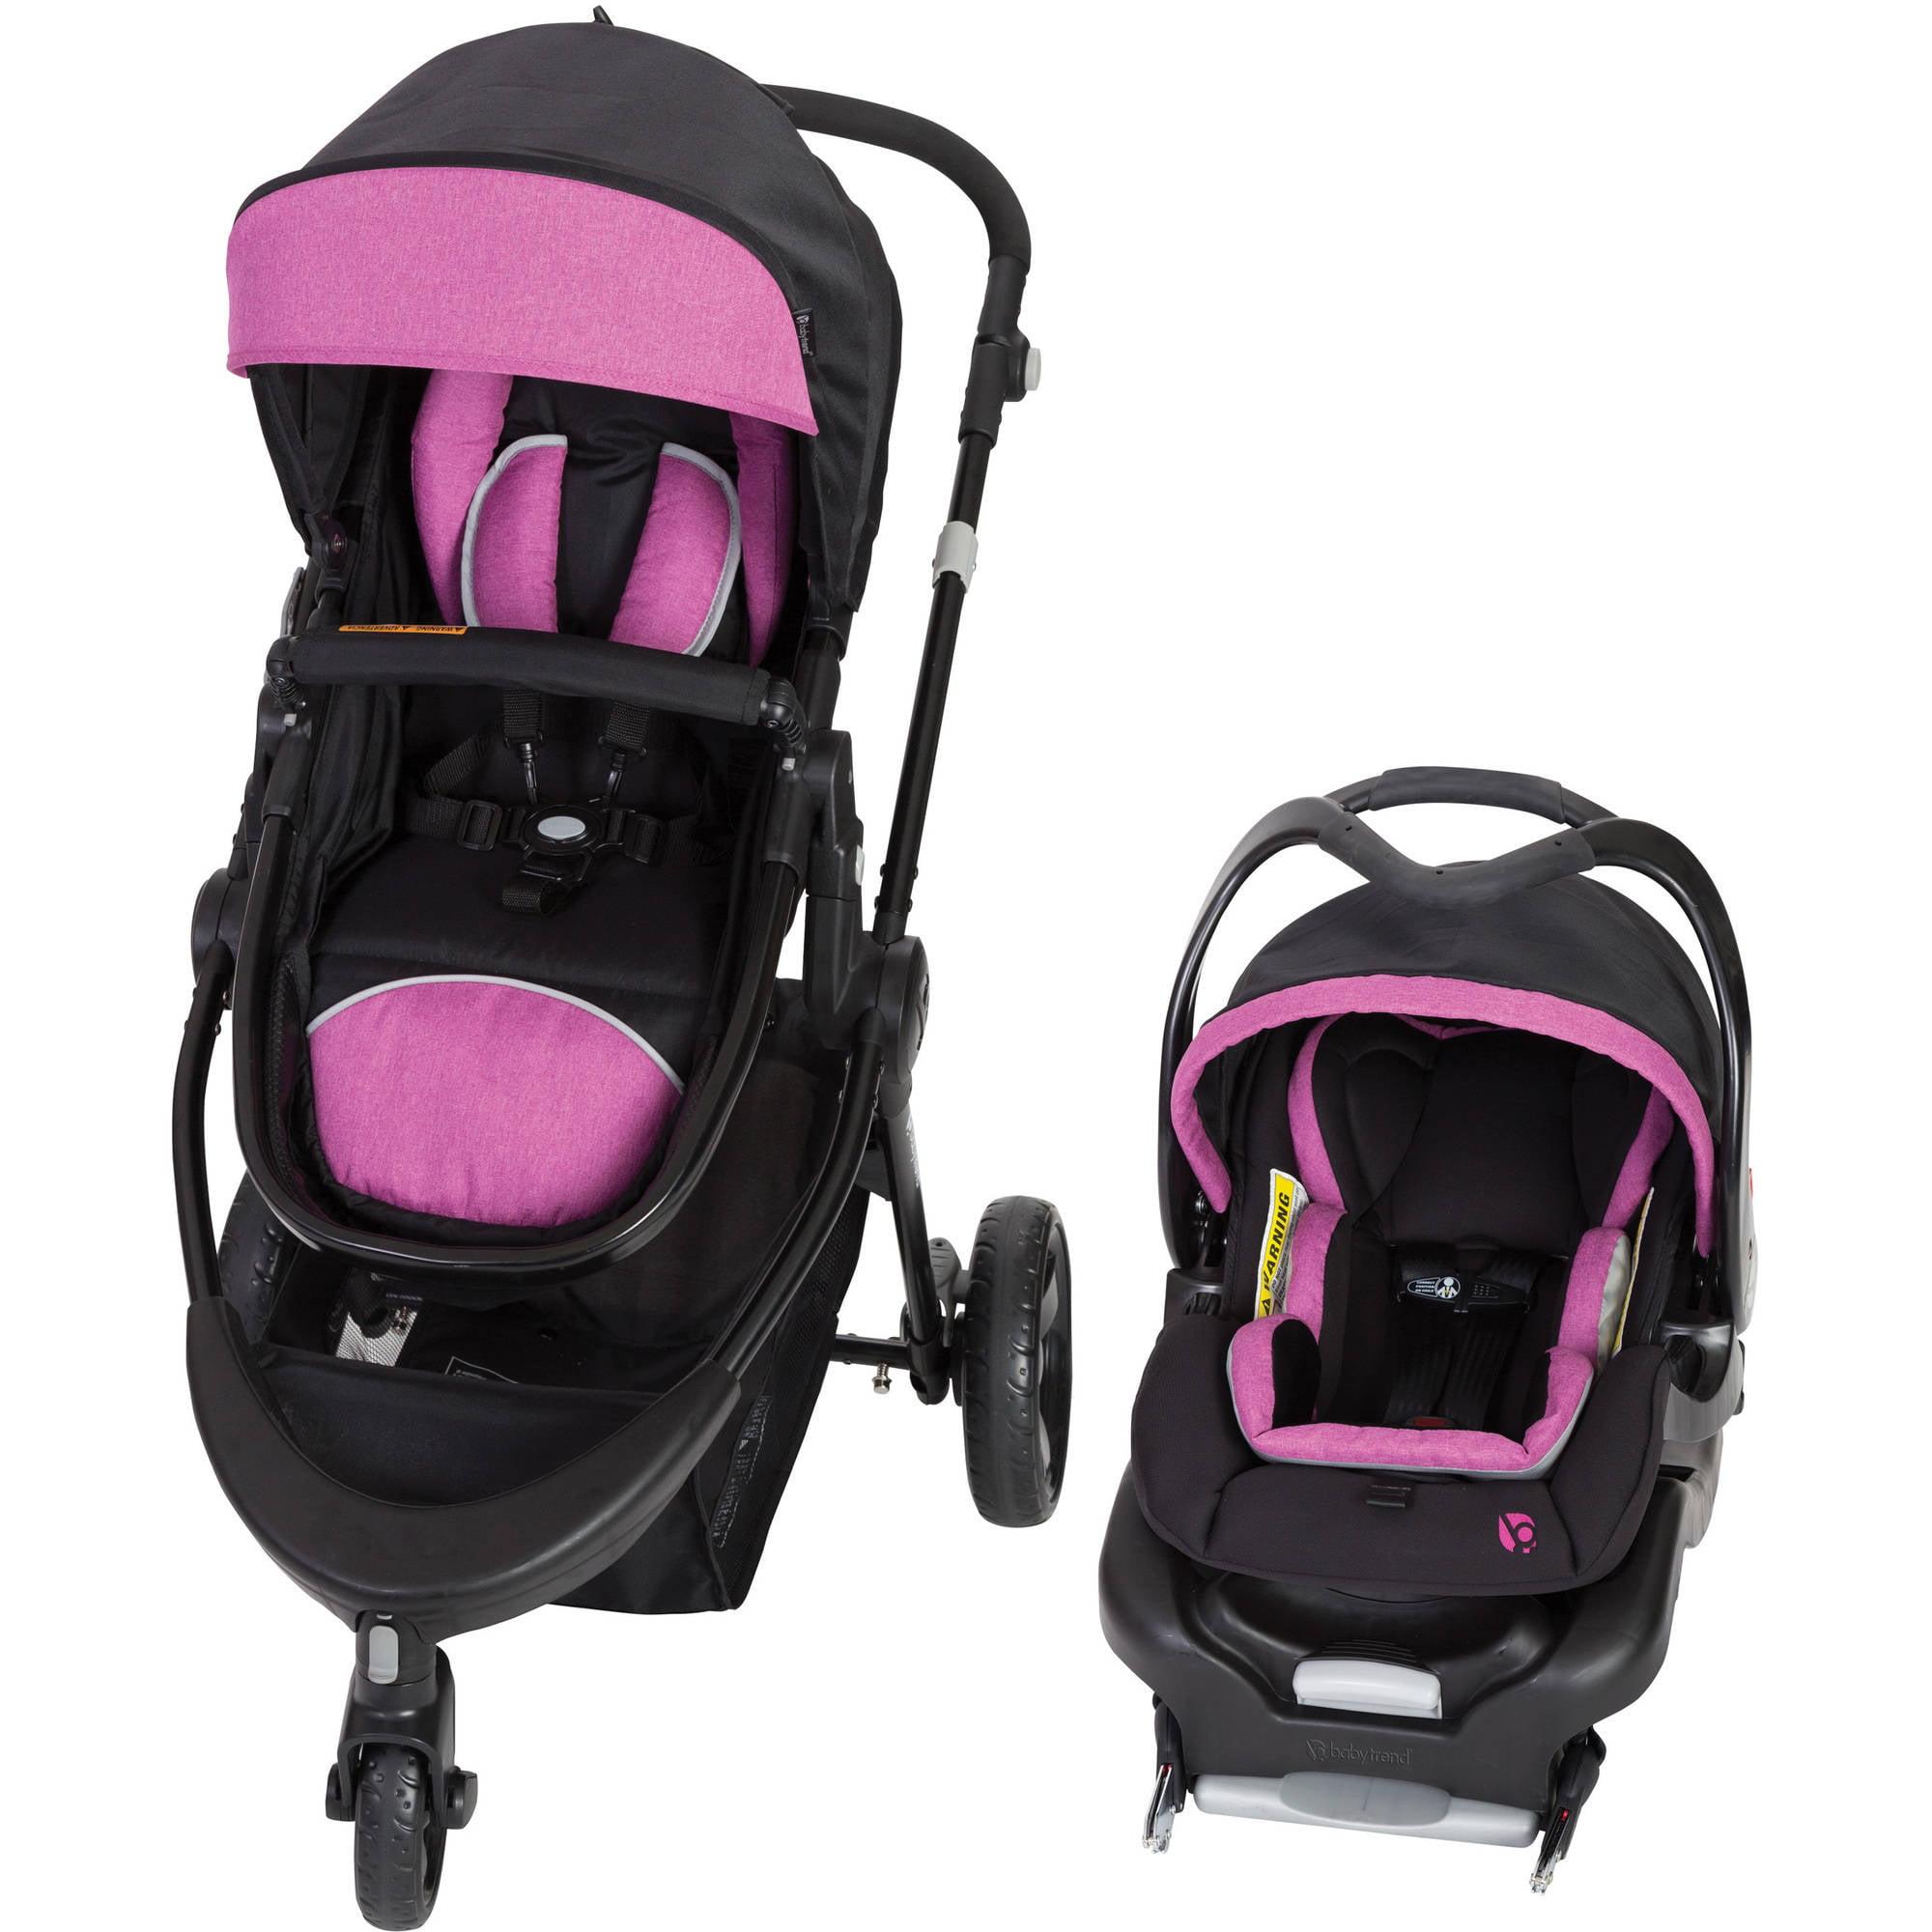 Baby Trend 1st Debut 3-Wheel Travel System, Priscilla